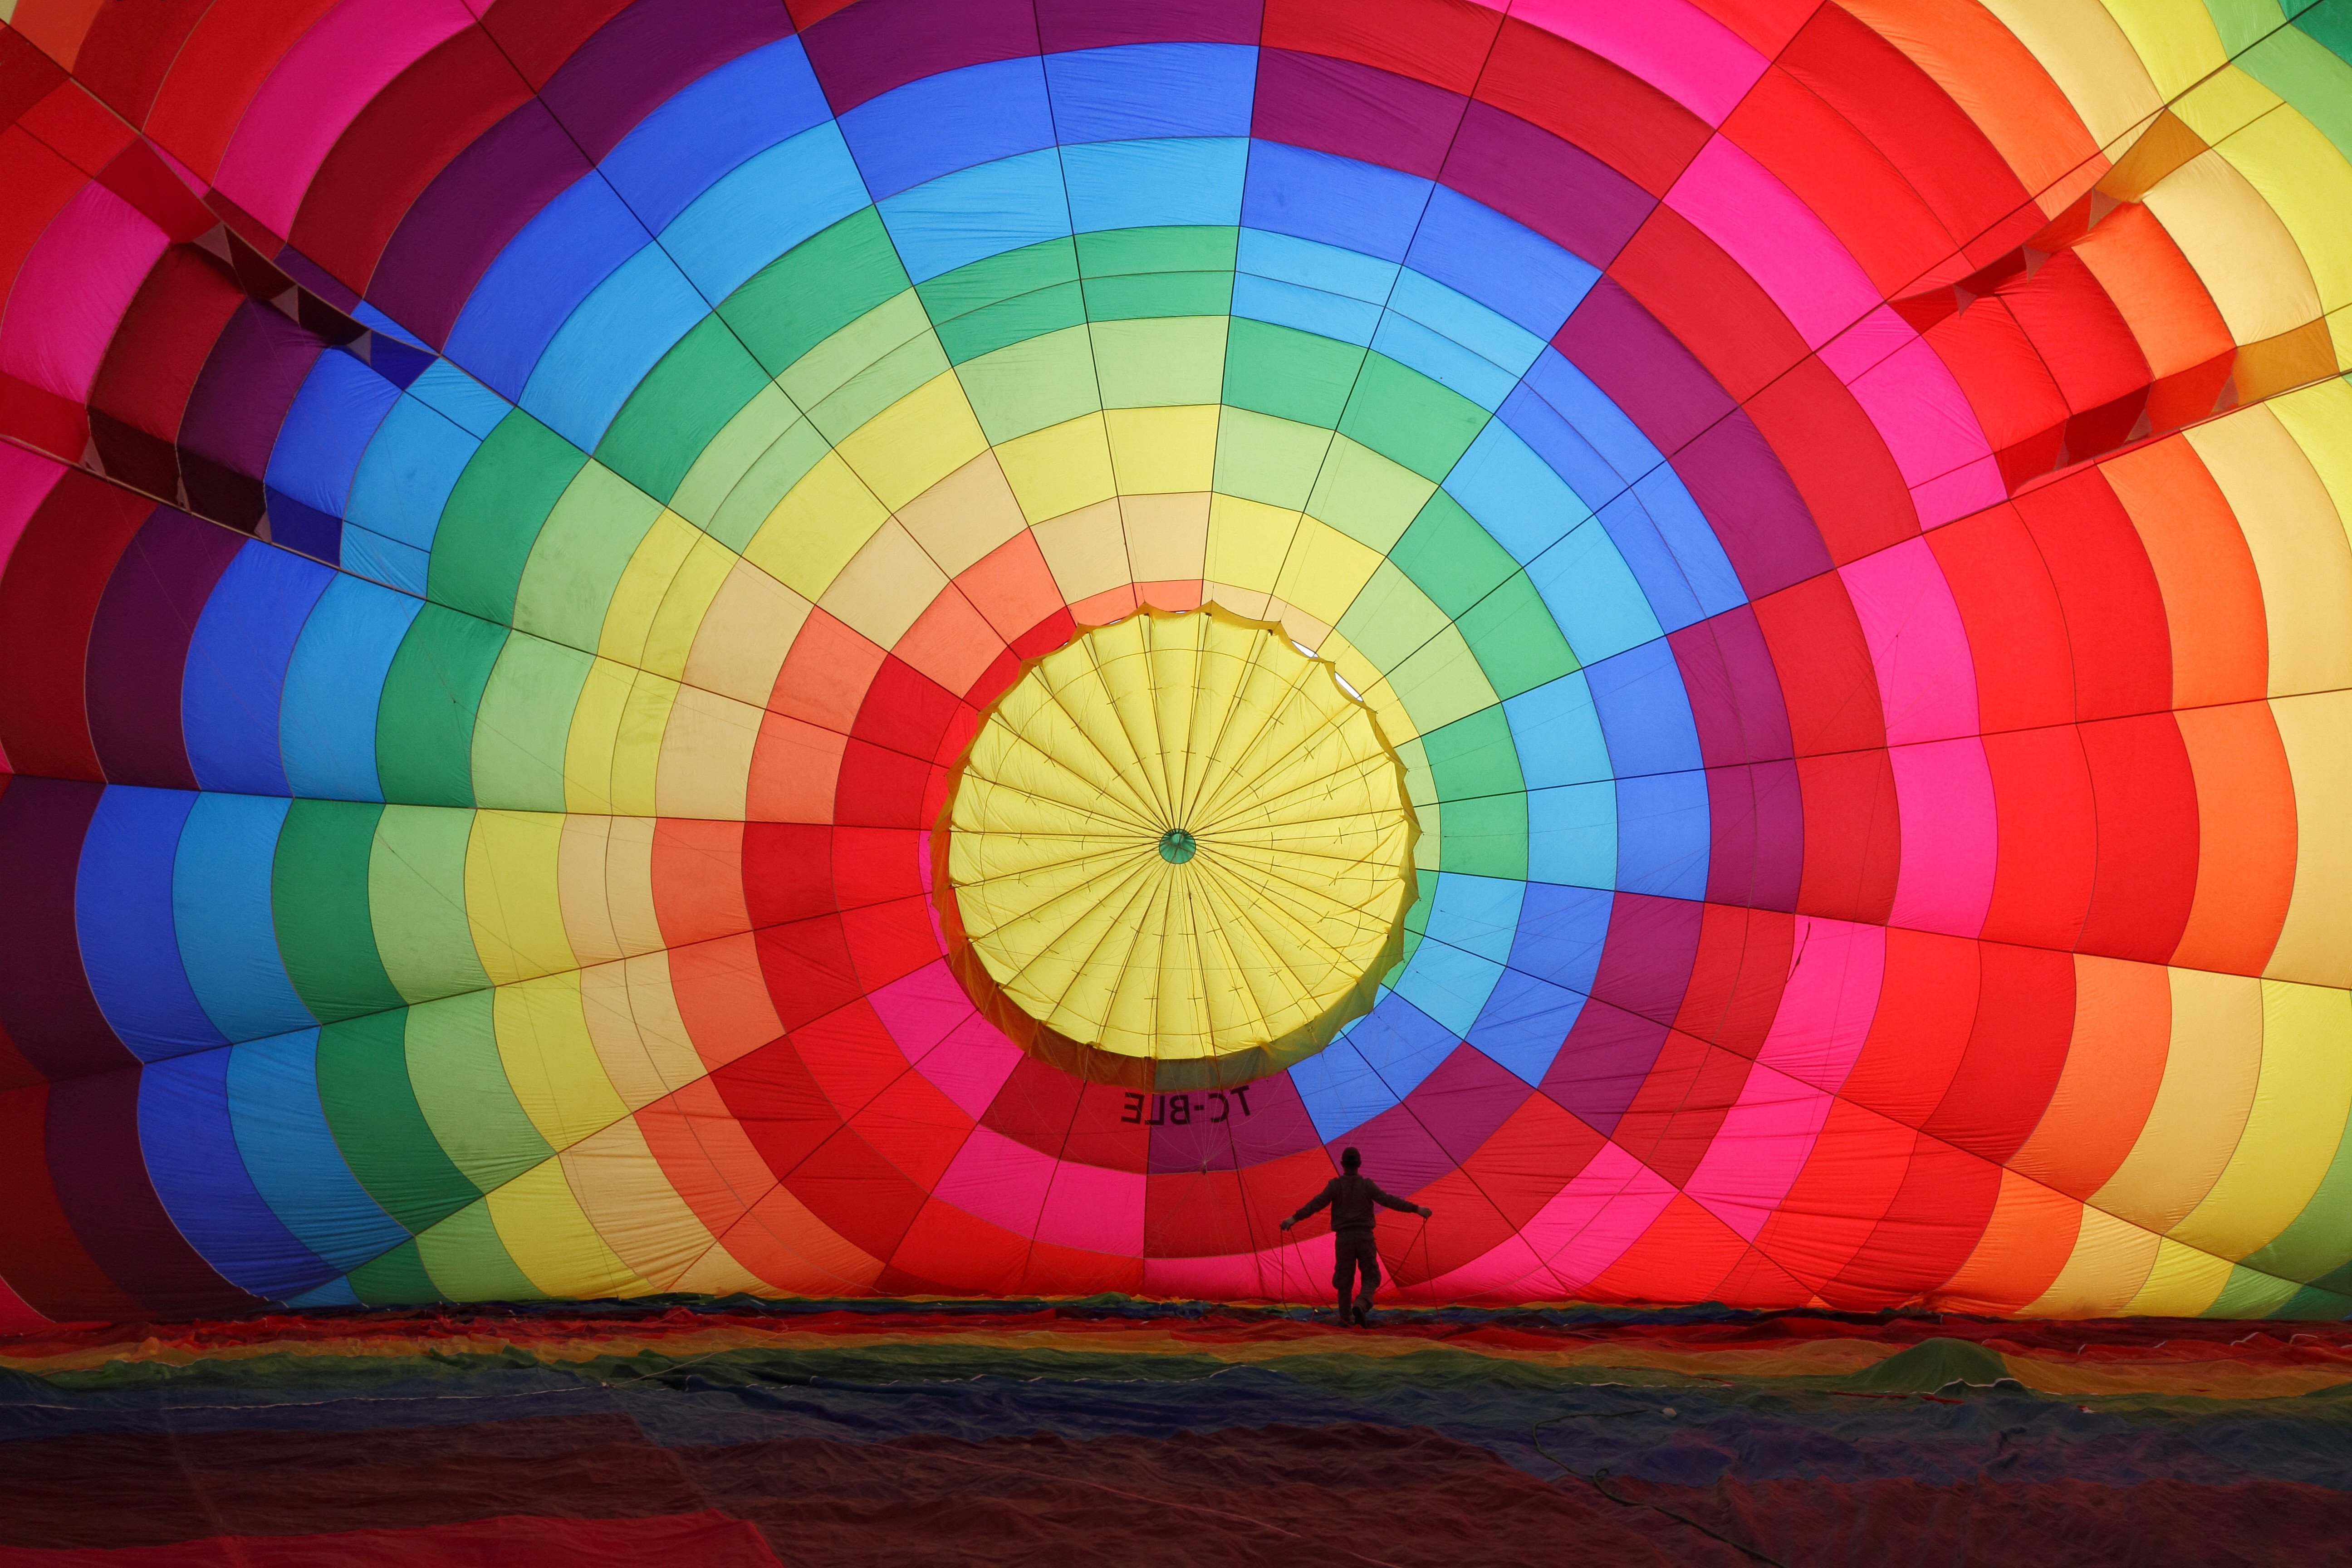 File:Cappadocia Balloon Inflating Wikimedia Commons.JPG ...